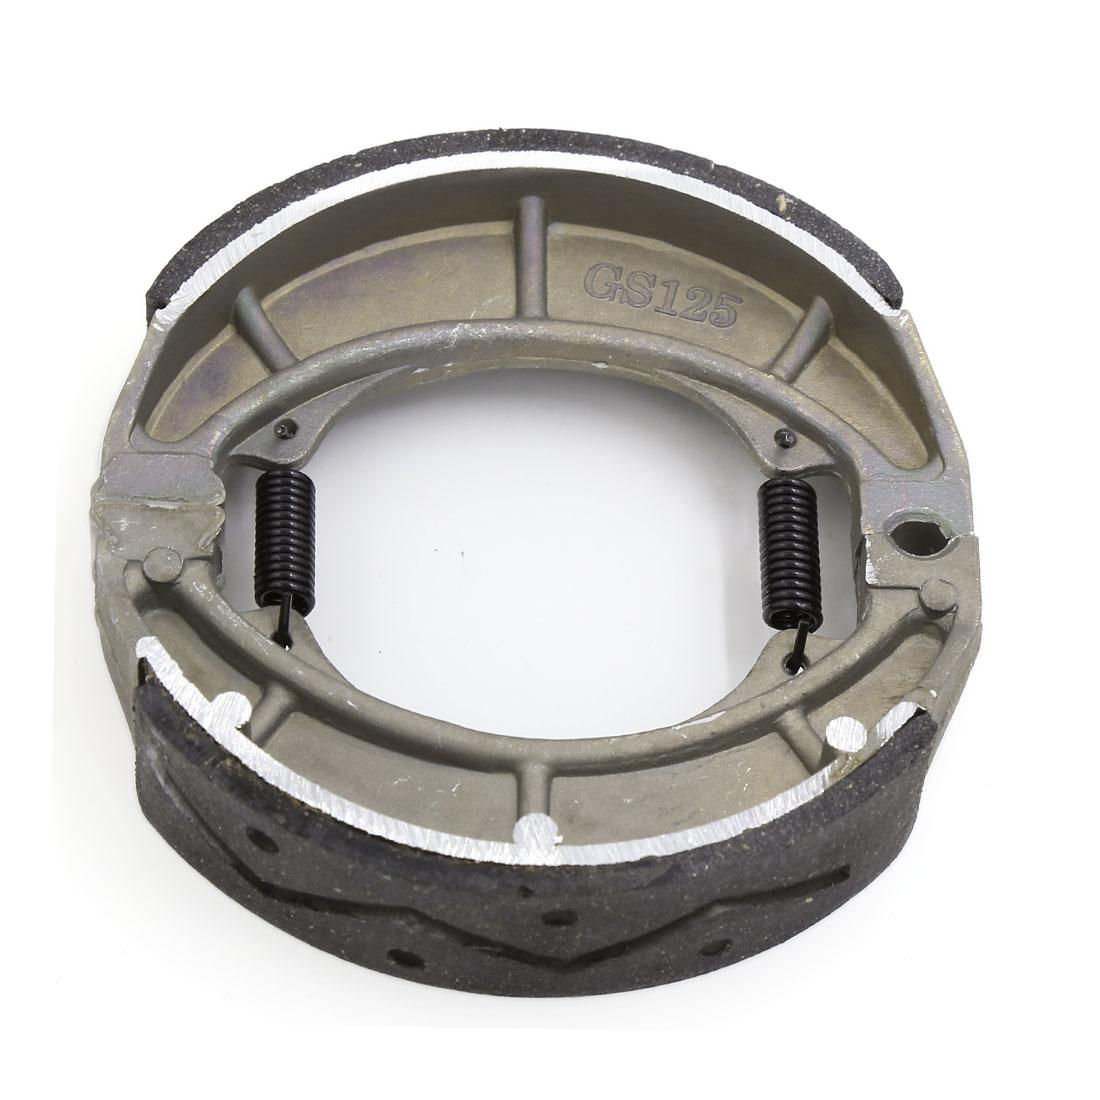 Electric Bicycle Motorcycle Metal Ceramic Spring Brake Shoes Drum Pad for GS125